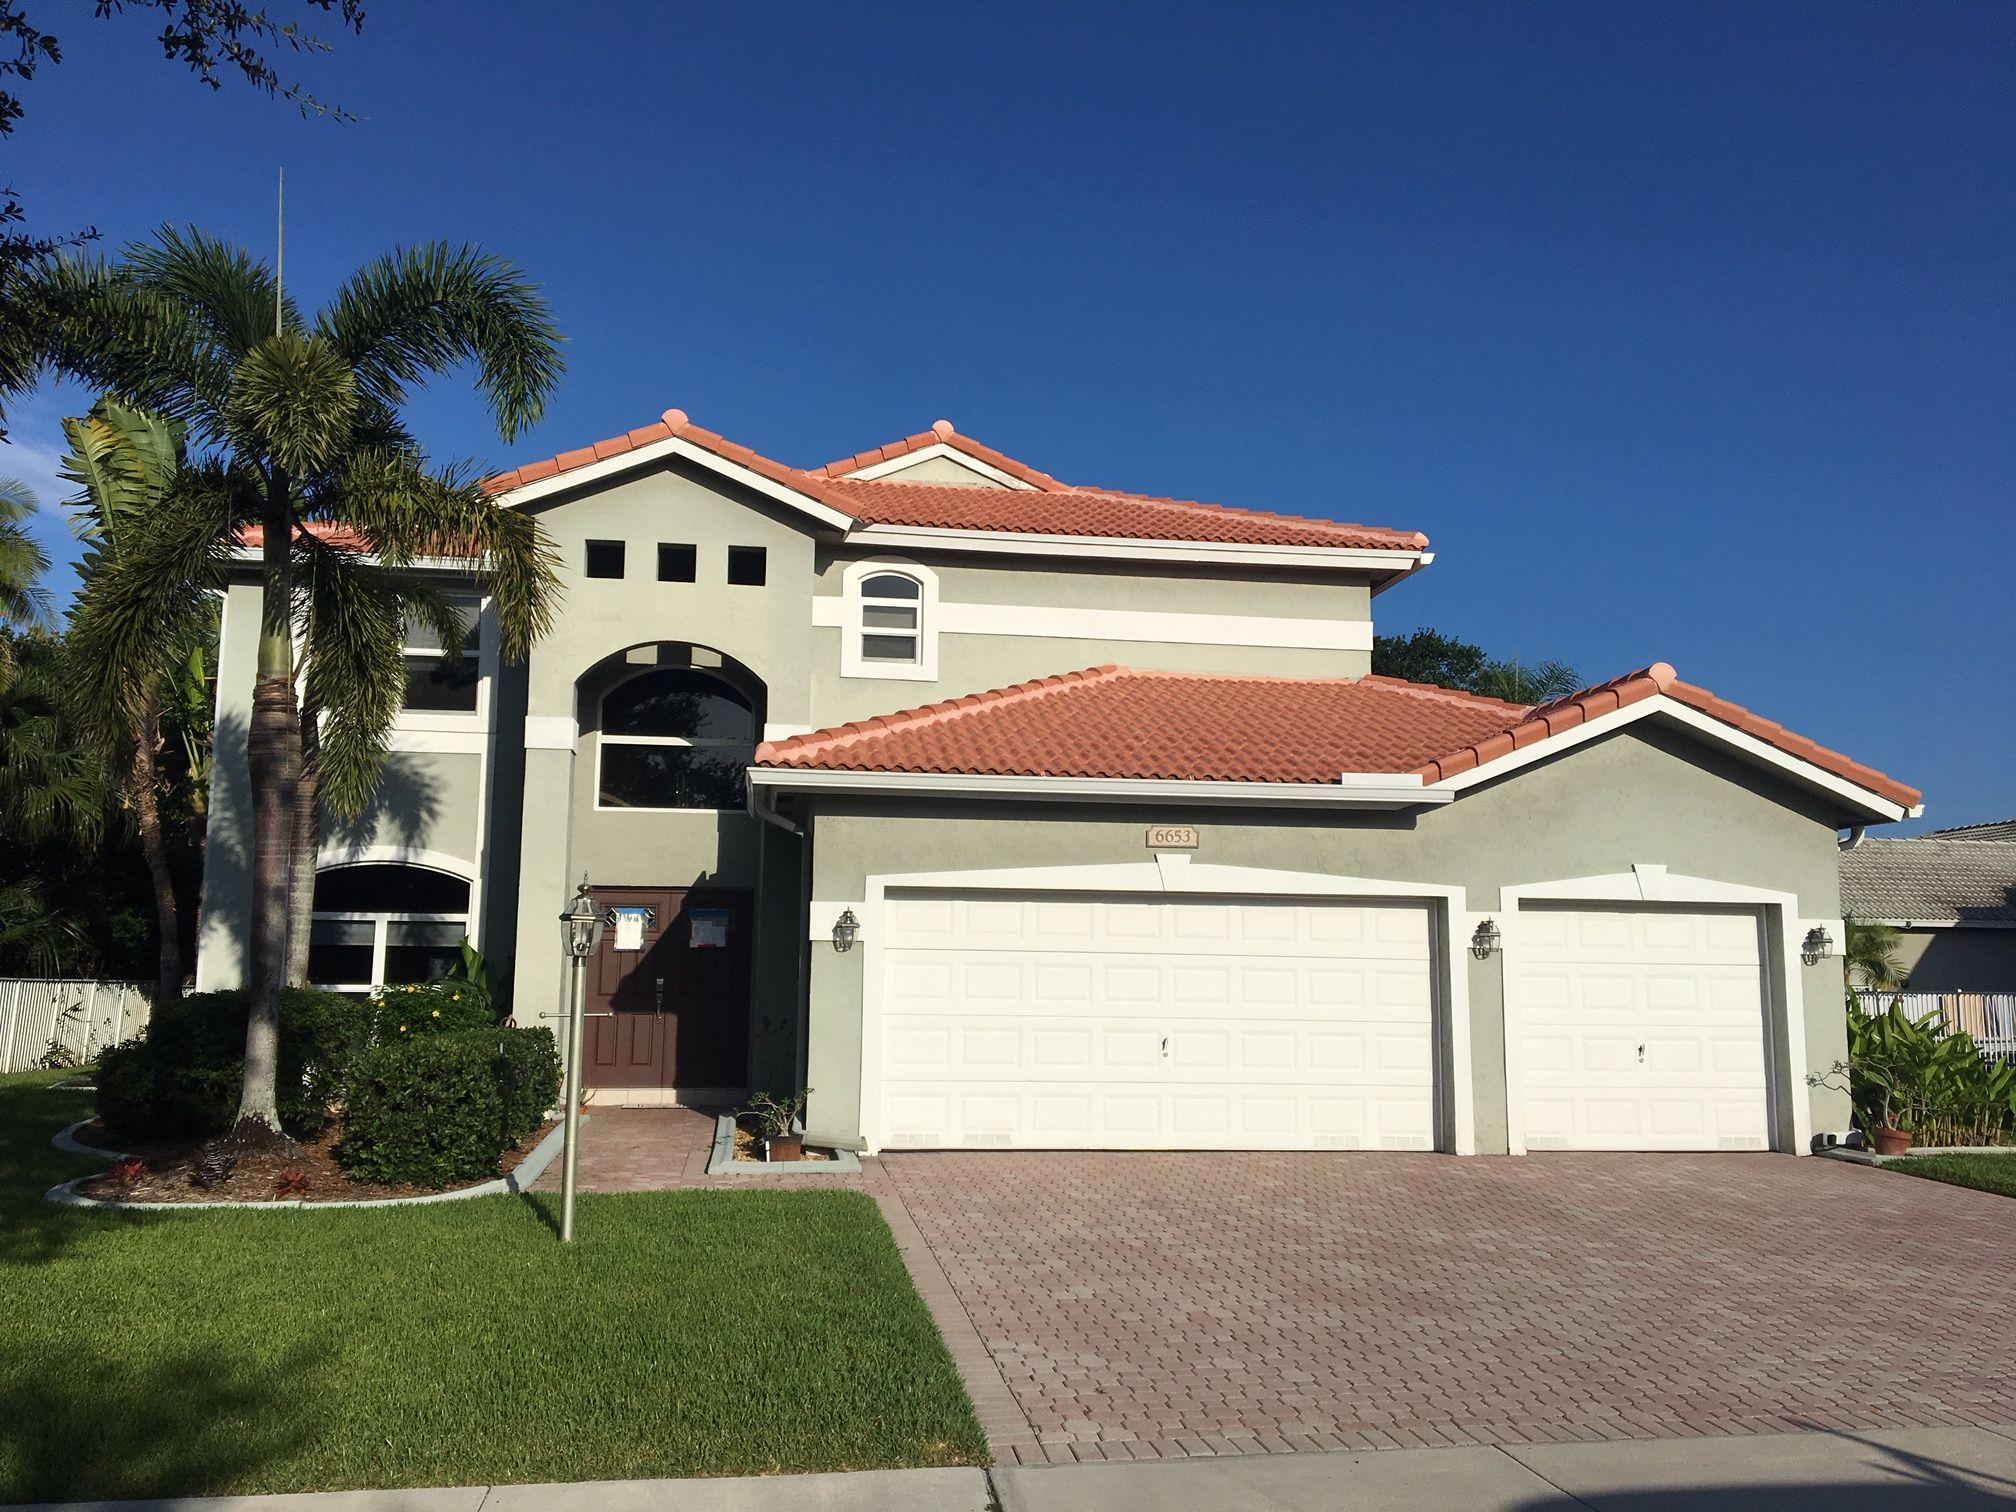 Best Boral Estate S Concrete Roof Tile In Salmon Color 640 x 480